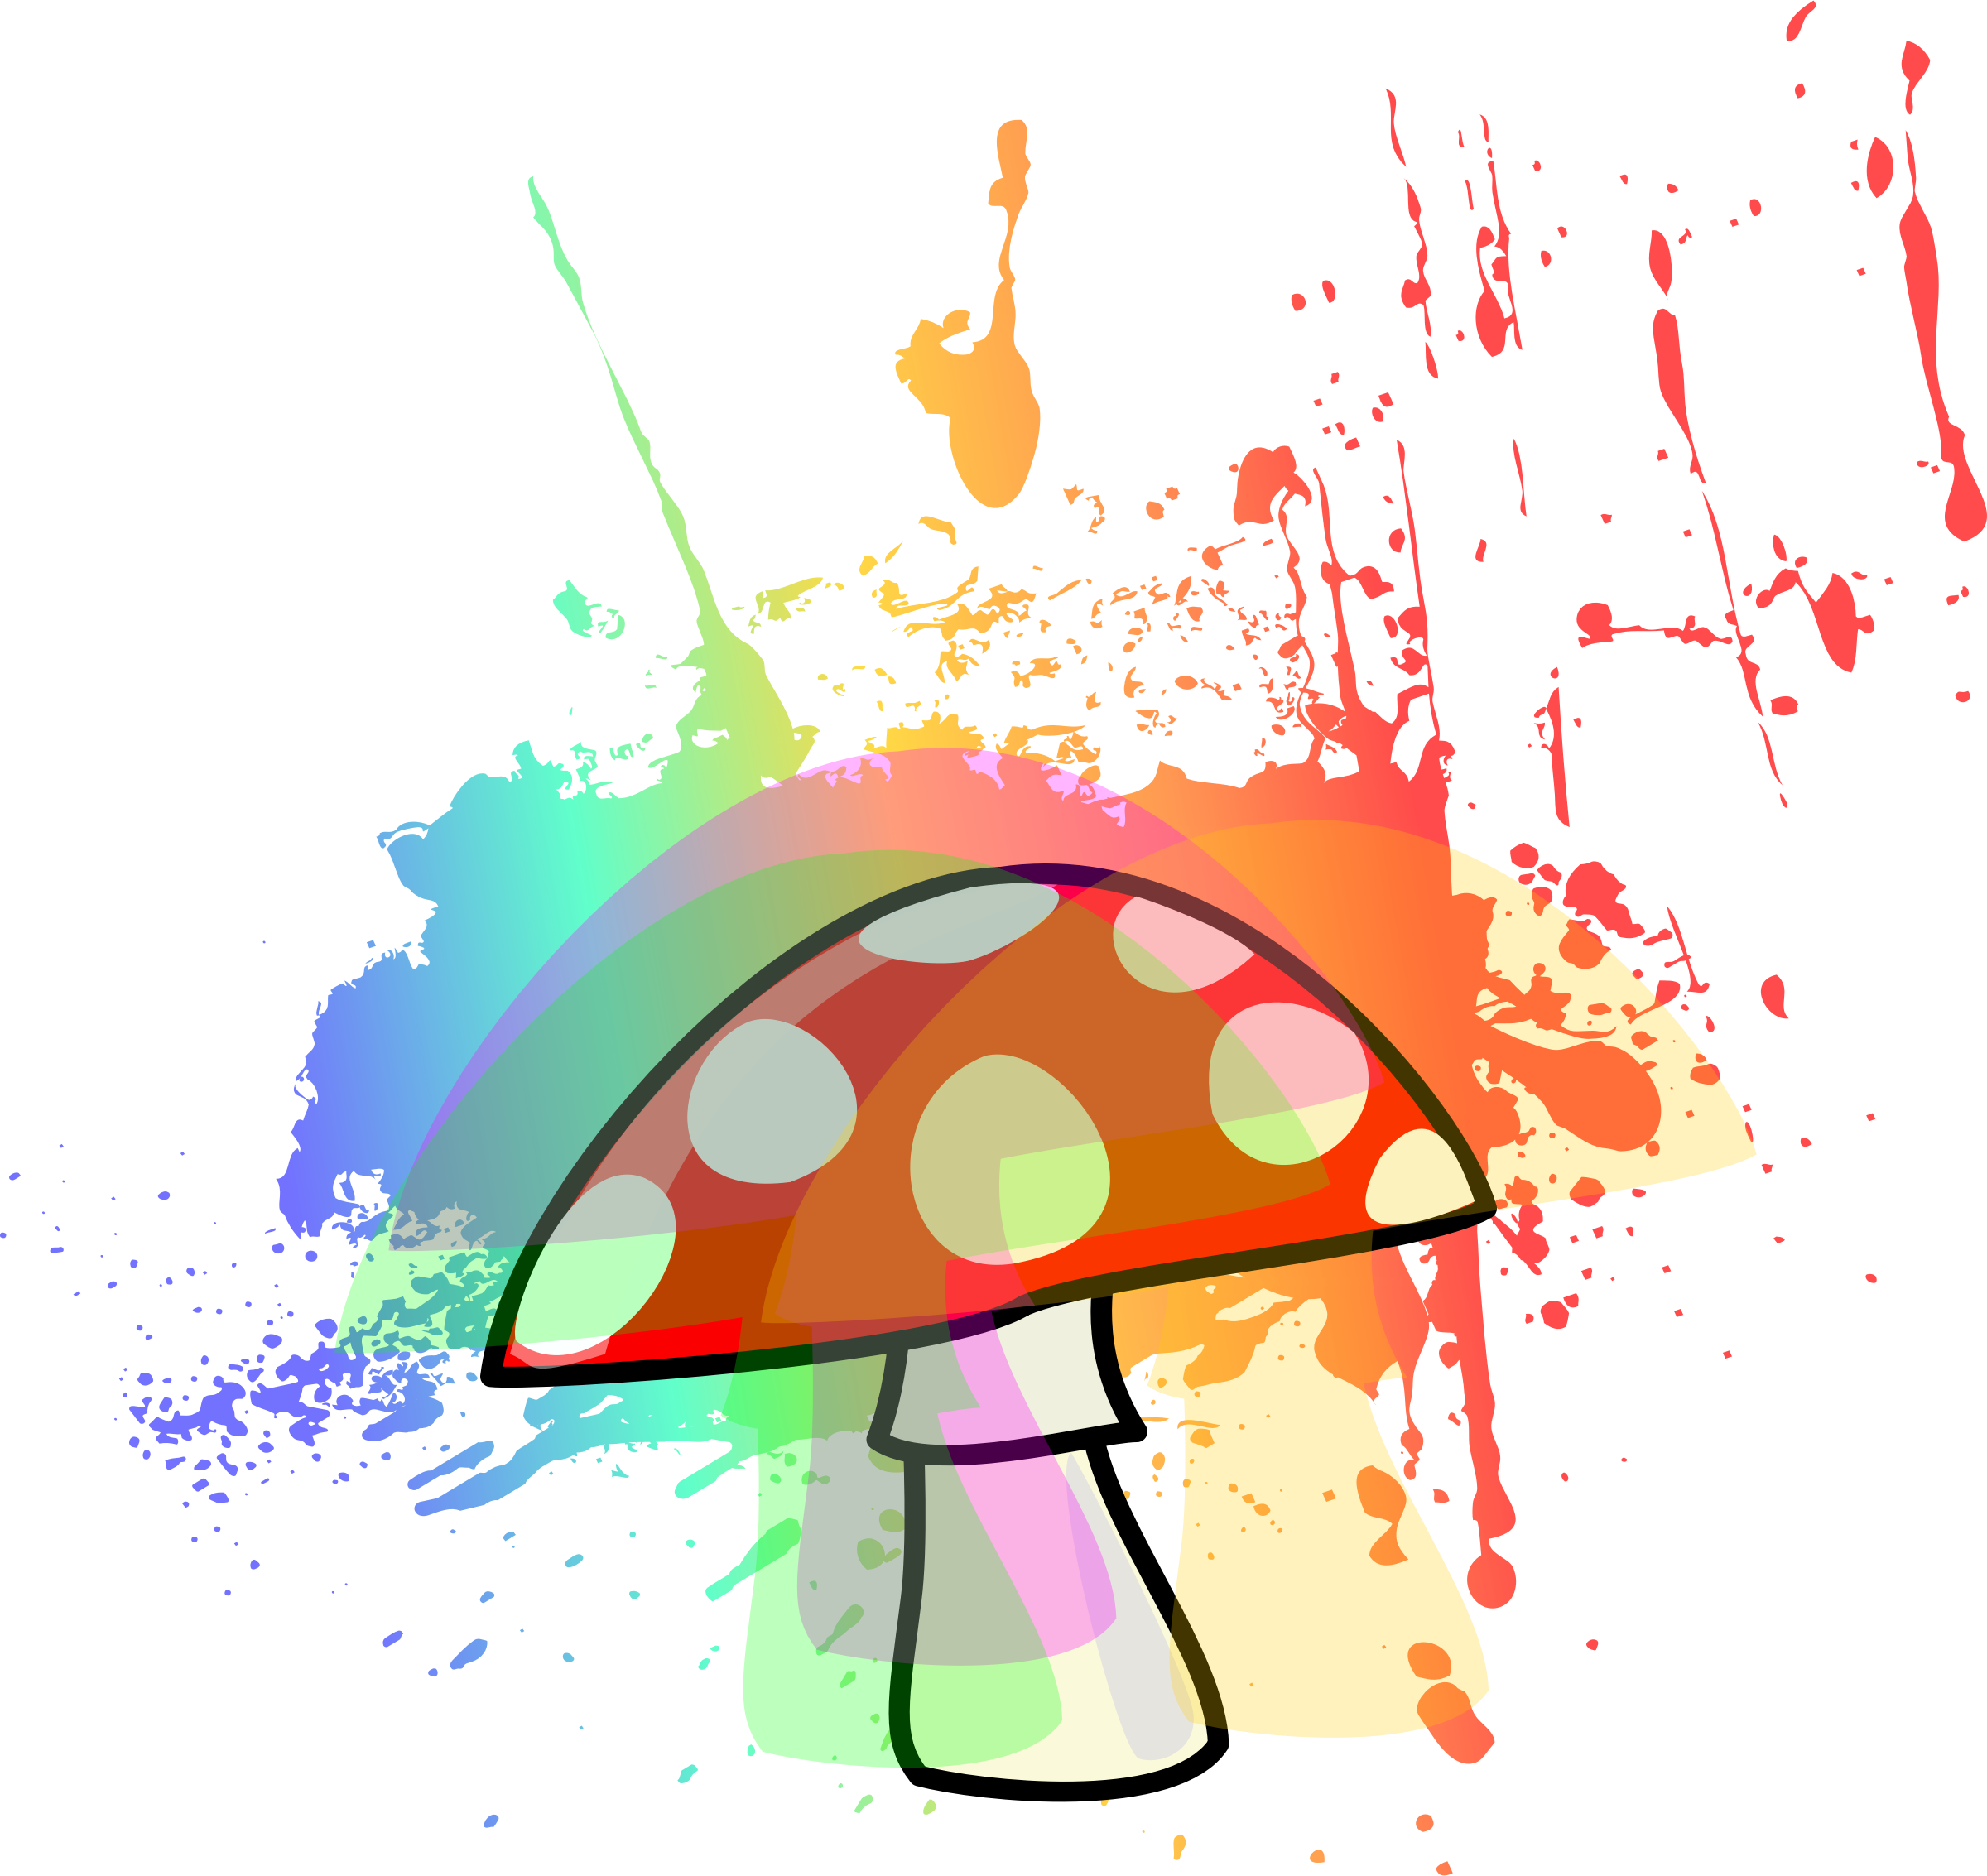 jpg download Psychedelic big image png. Mushroom clipart trippy.